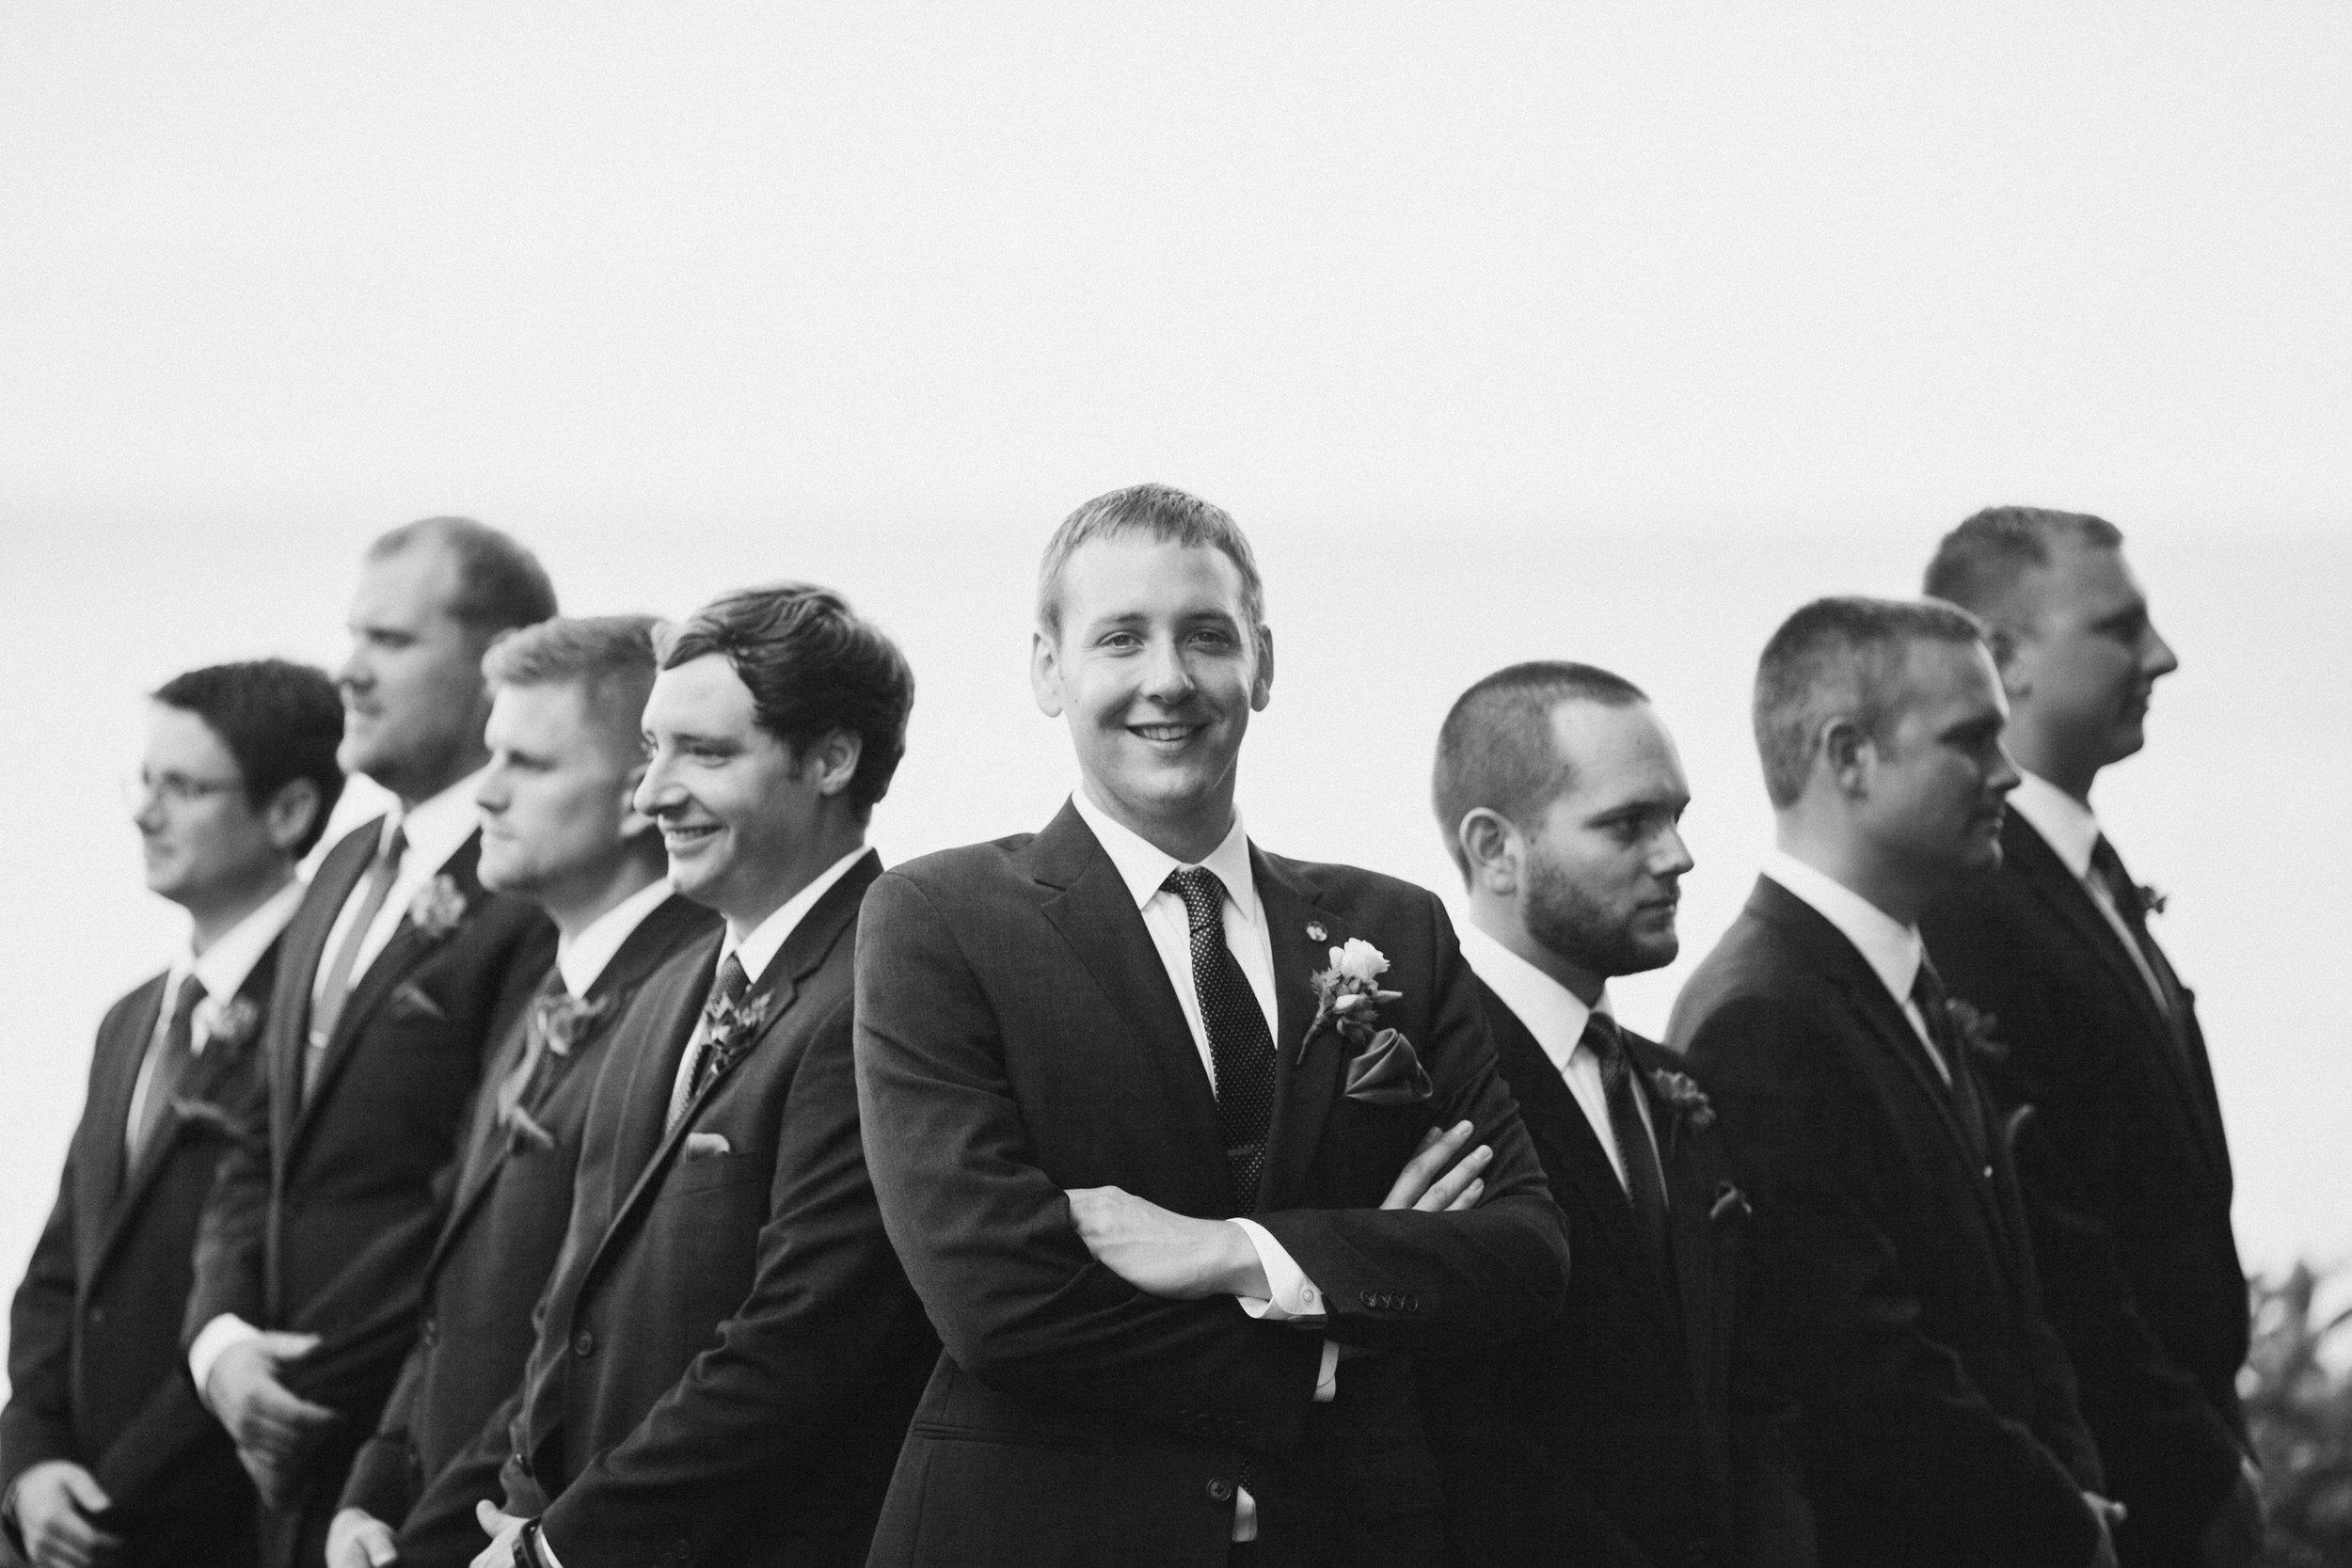 wisconsin-wedding-acowsay-uttke-photography-43.jpg